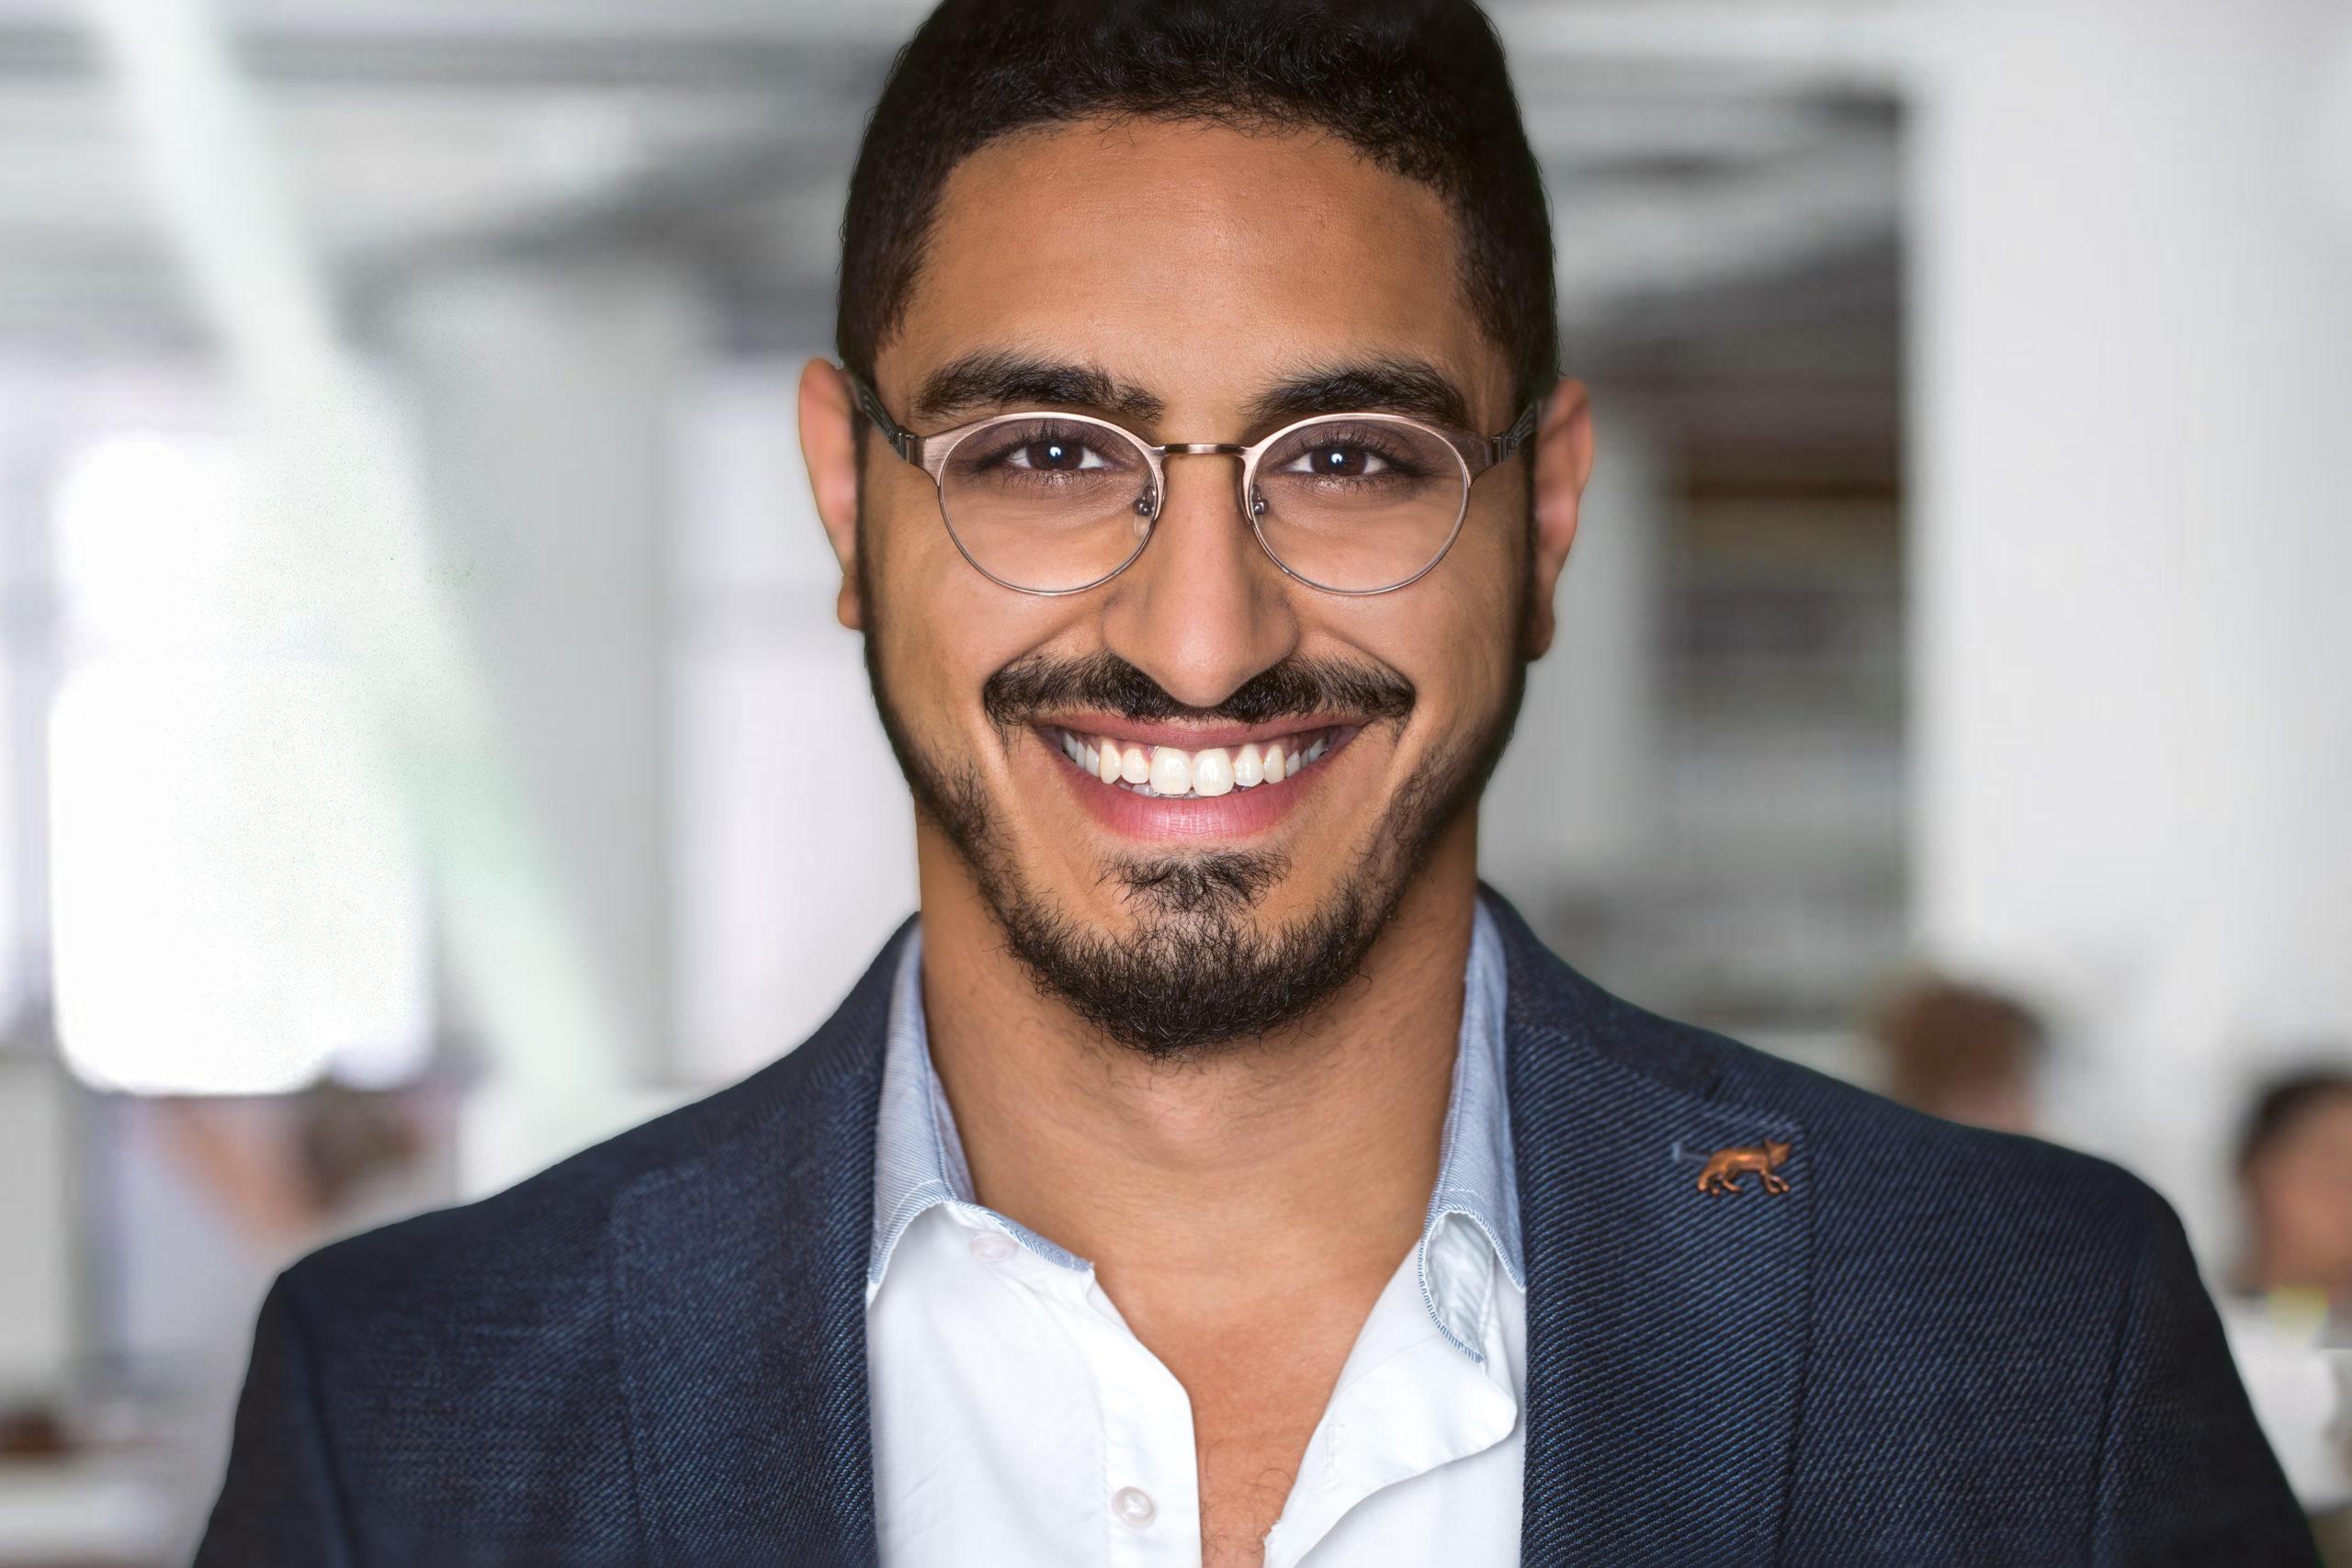 Ep266: Bars and Brainwaves, with Myndlift CEO and co-founder Aziz Kaddan